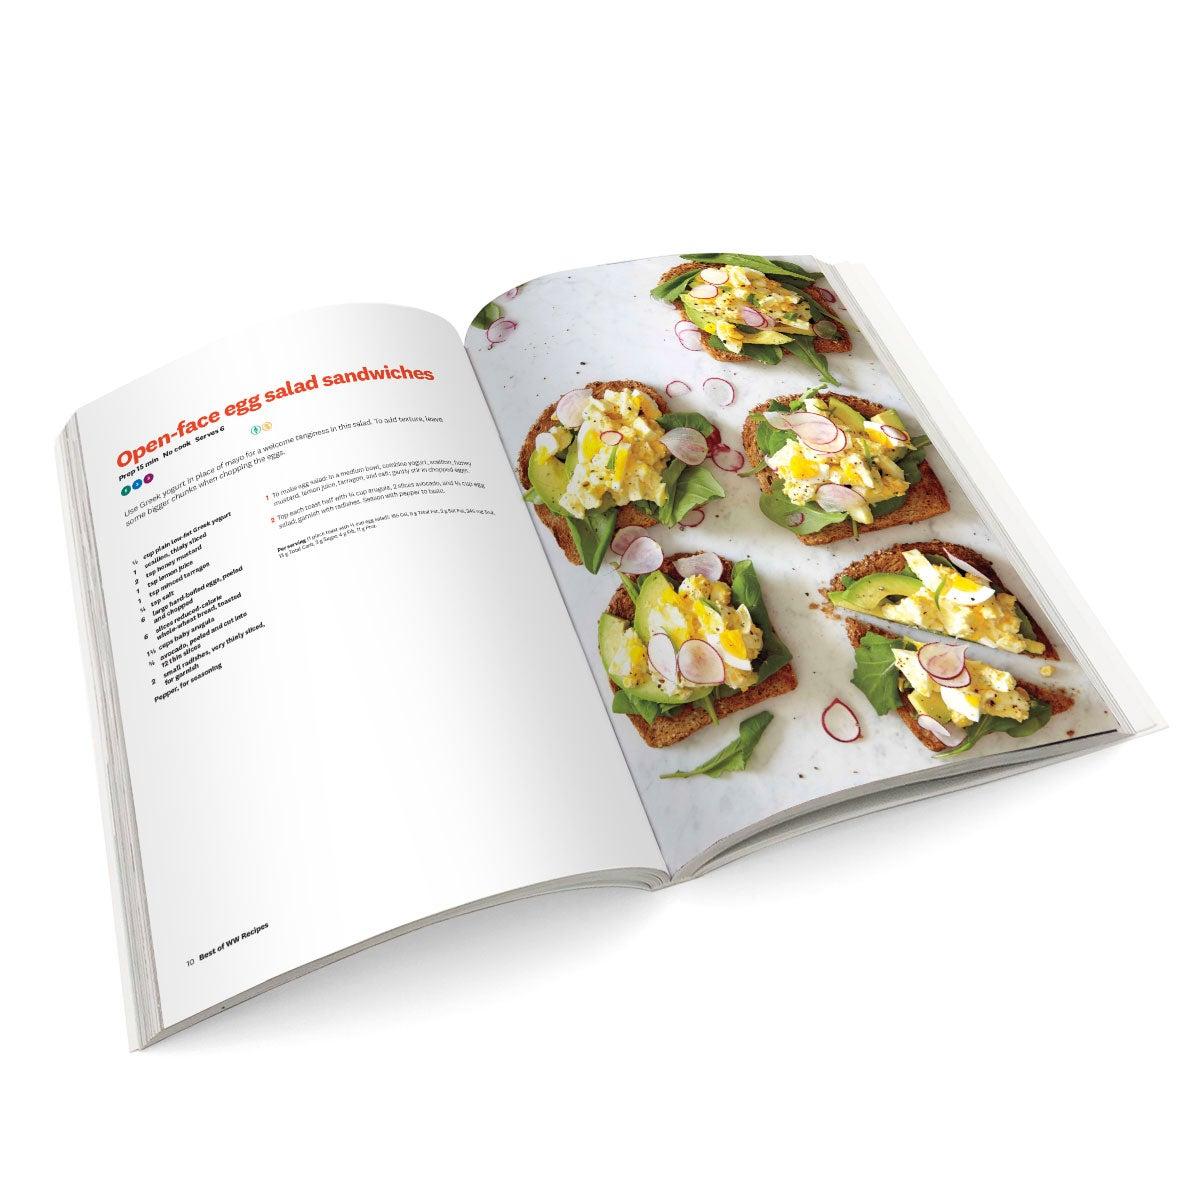 Best of WW Recipes Cookbook - Open Spread